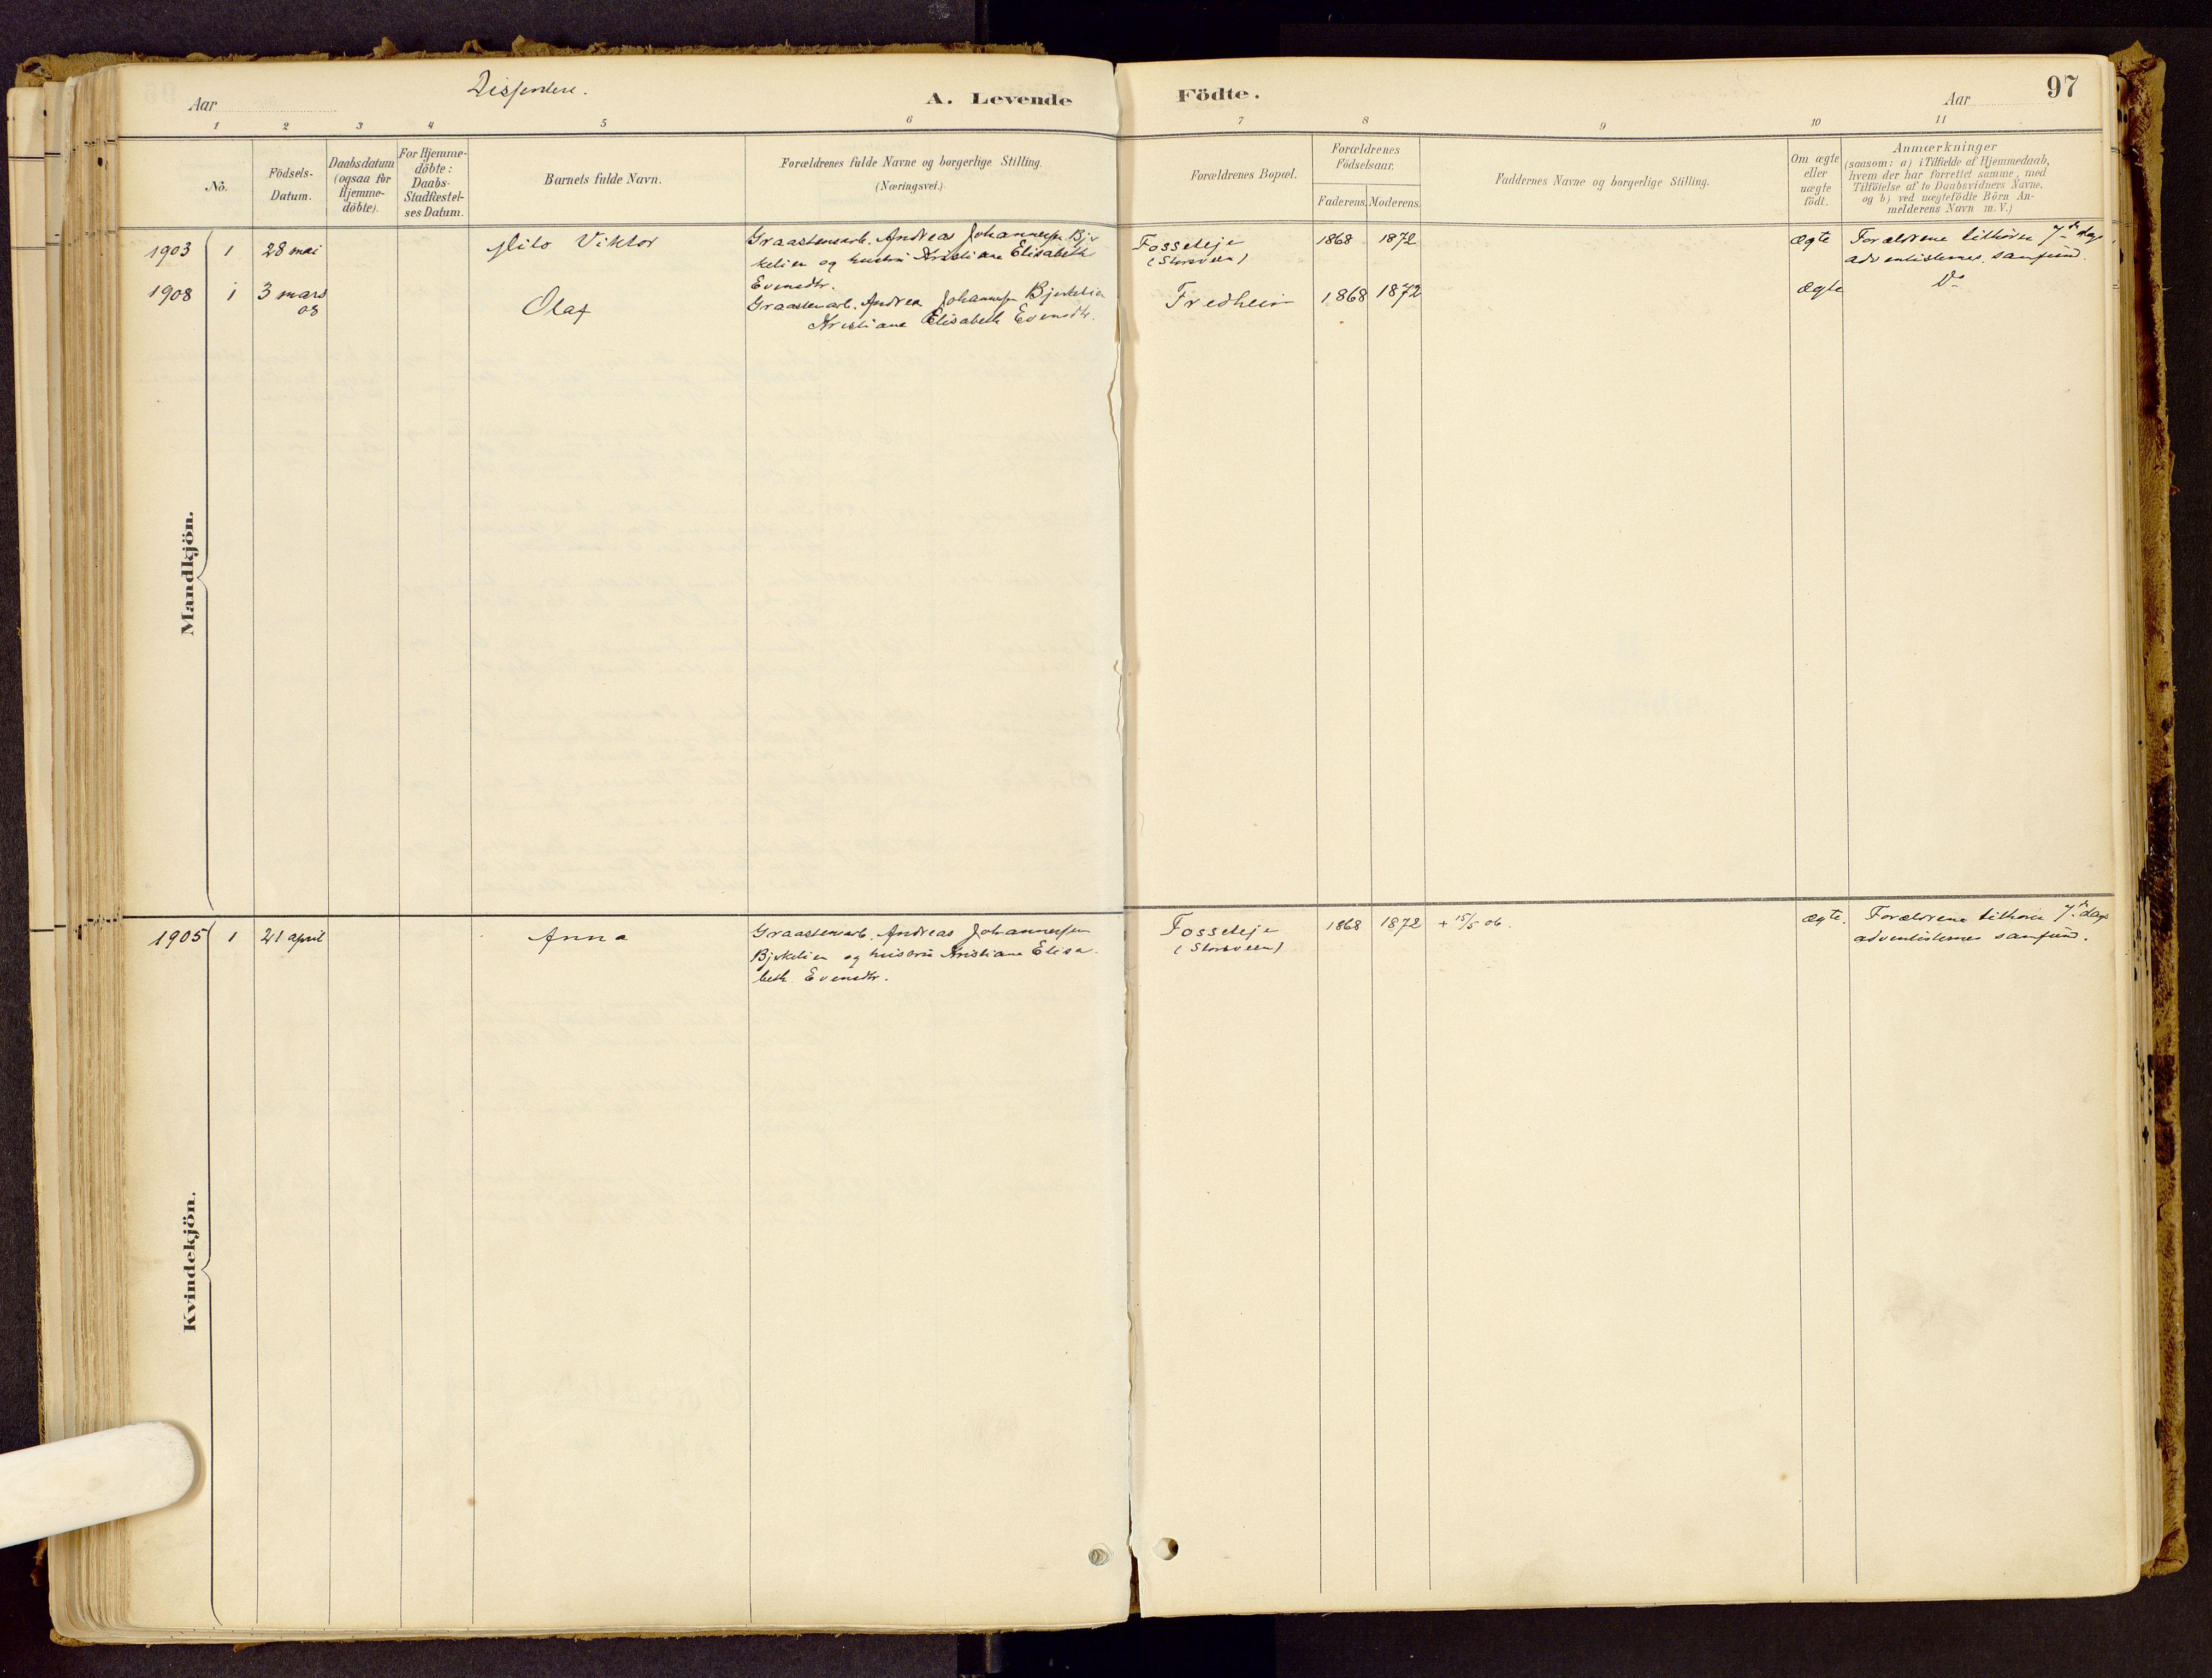 SAH, Vestre Gausdal prestekontor, Ministerialbok nr. 1, 1887-1914, s. 97